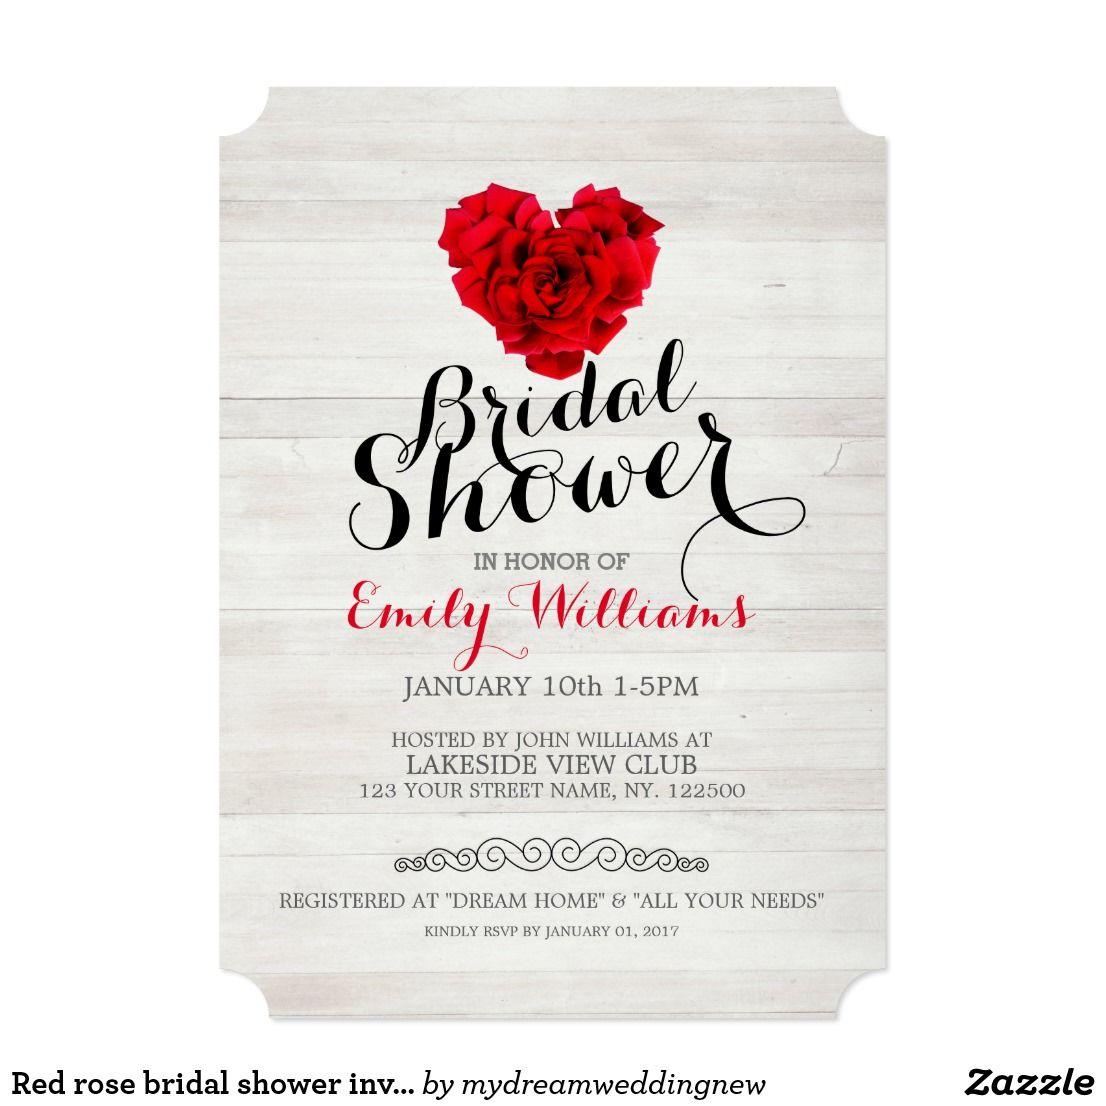 Red rose bridal shower invitation   Invites wedding, Bridal showers ...